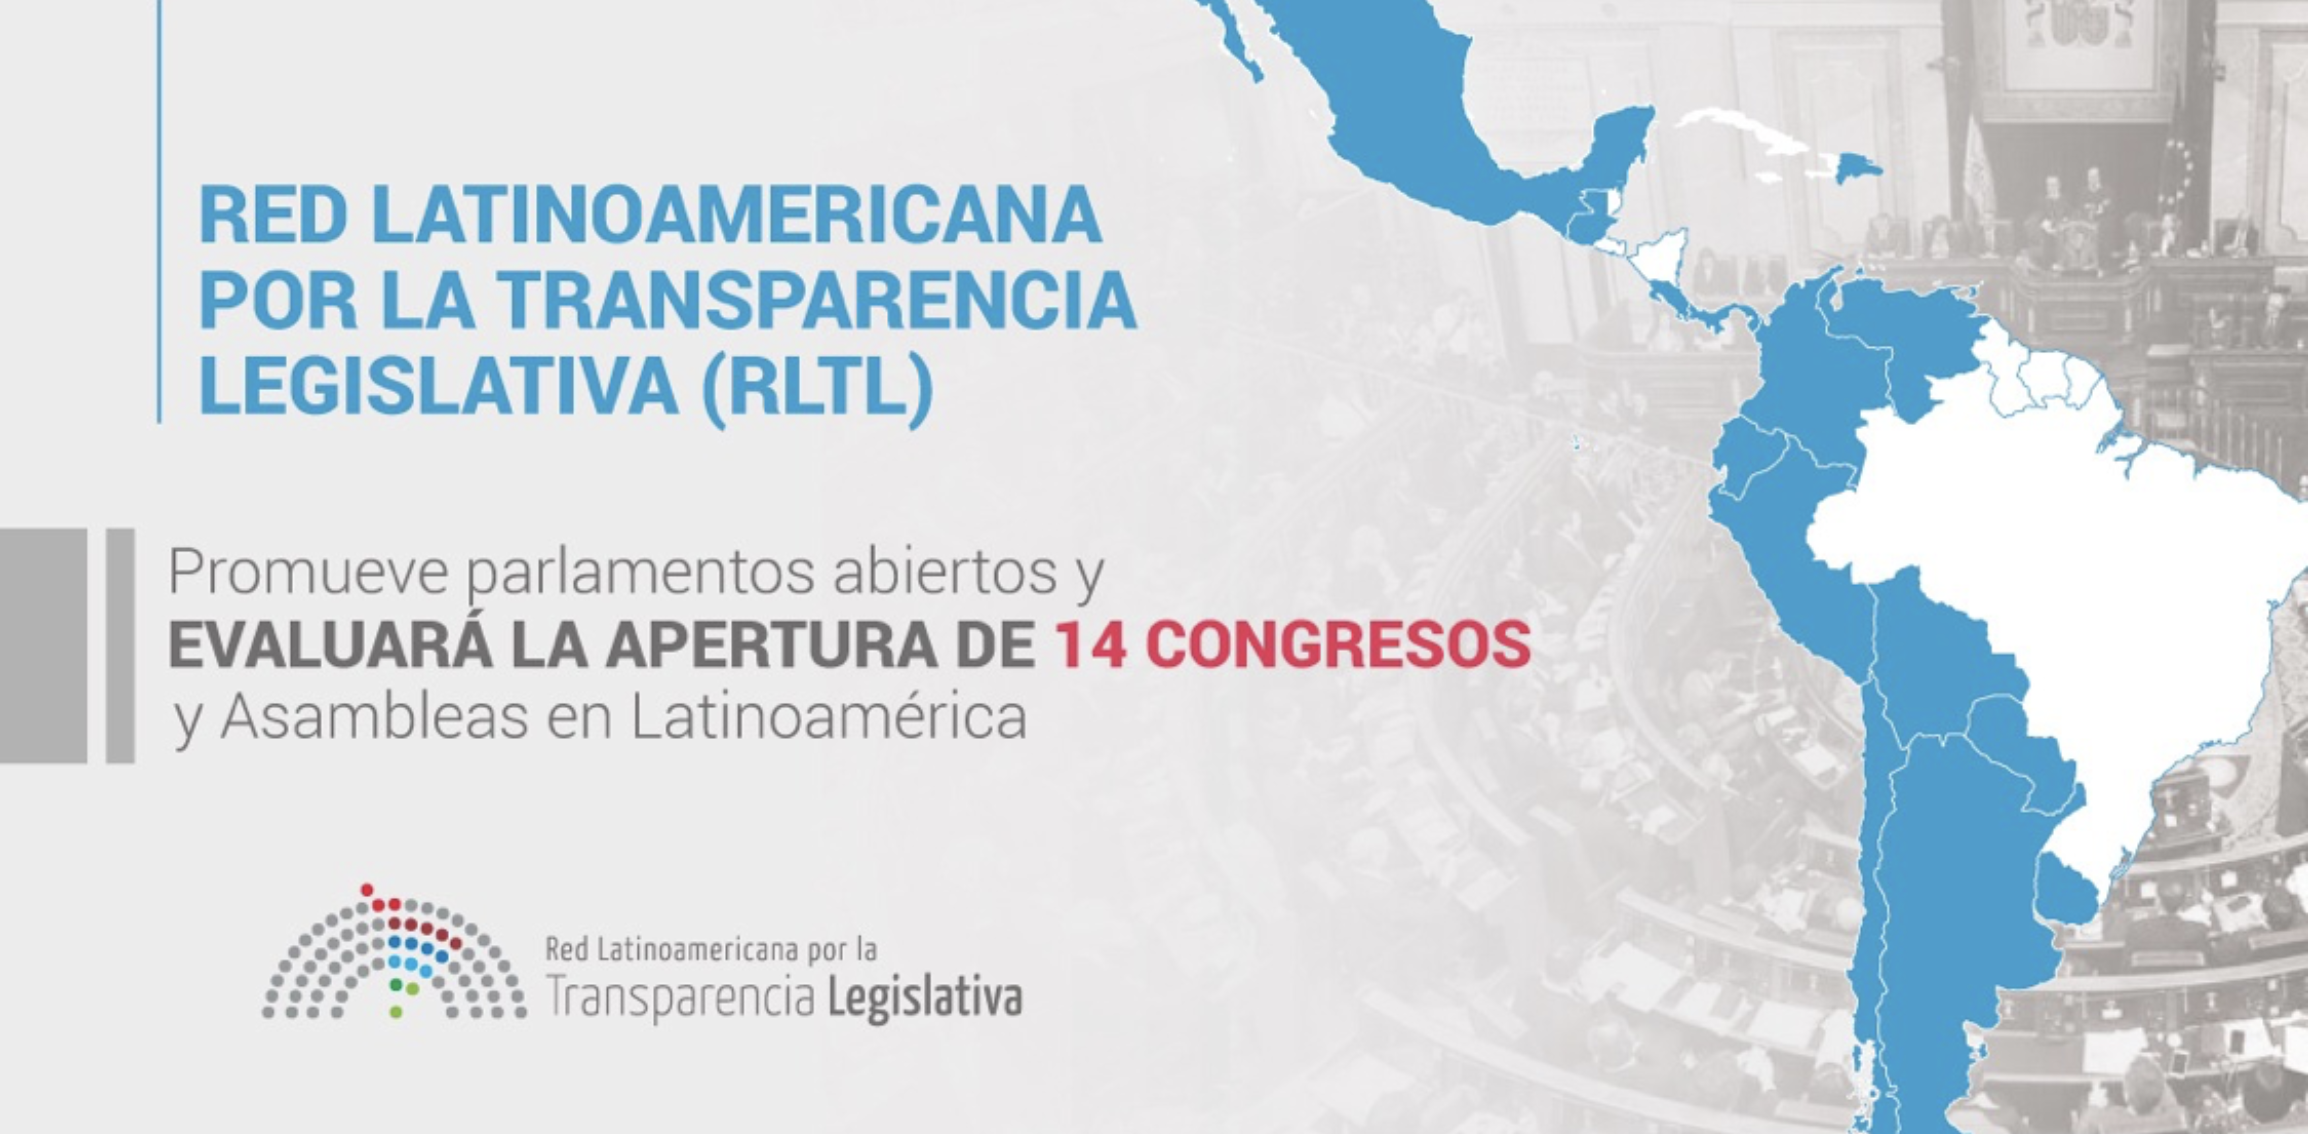 Índice Latinoamericano de Transparencia Legislativa 2021